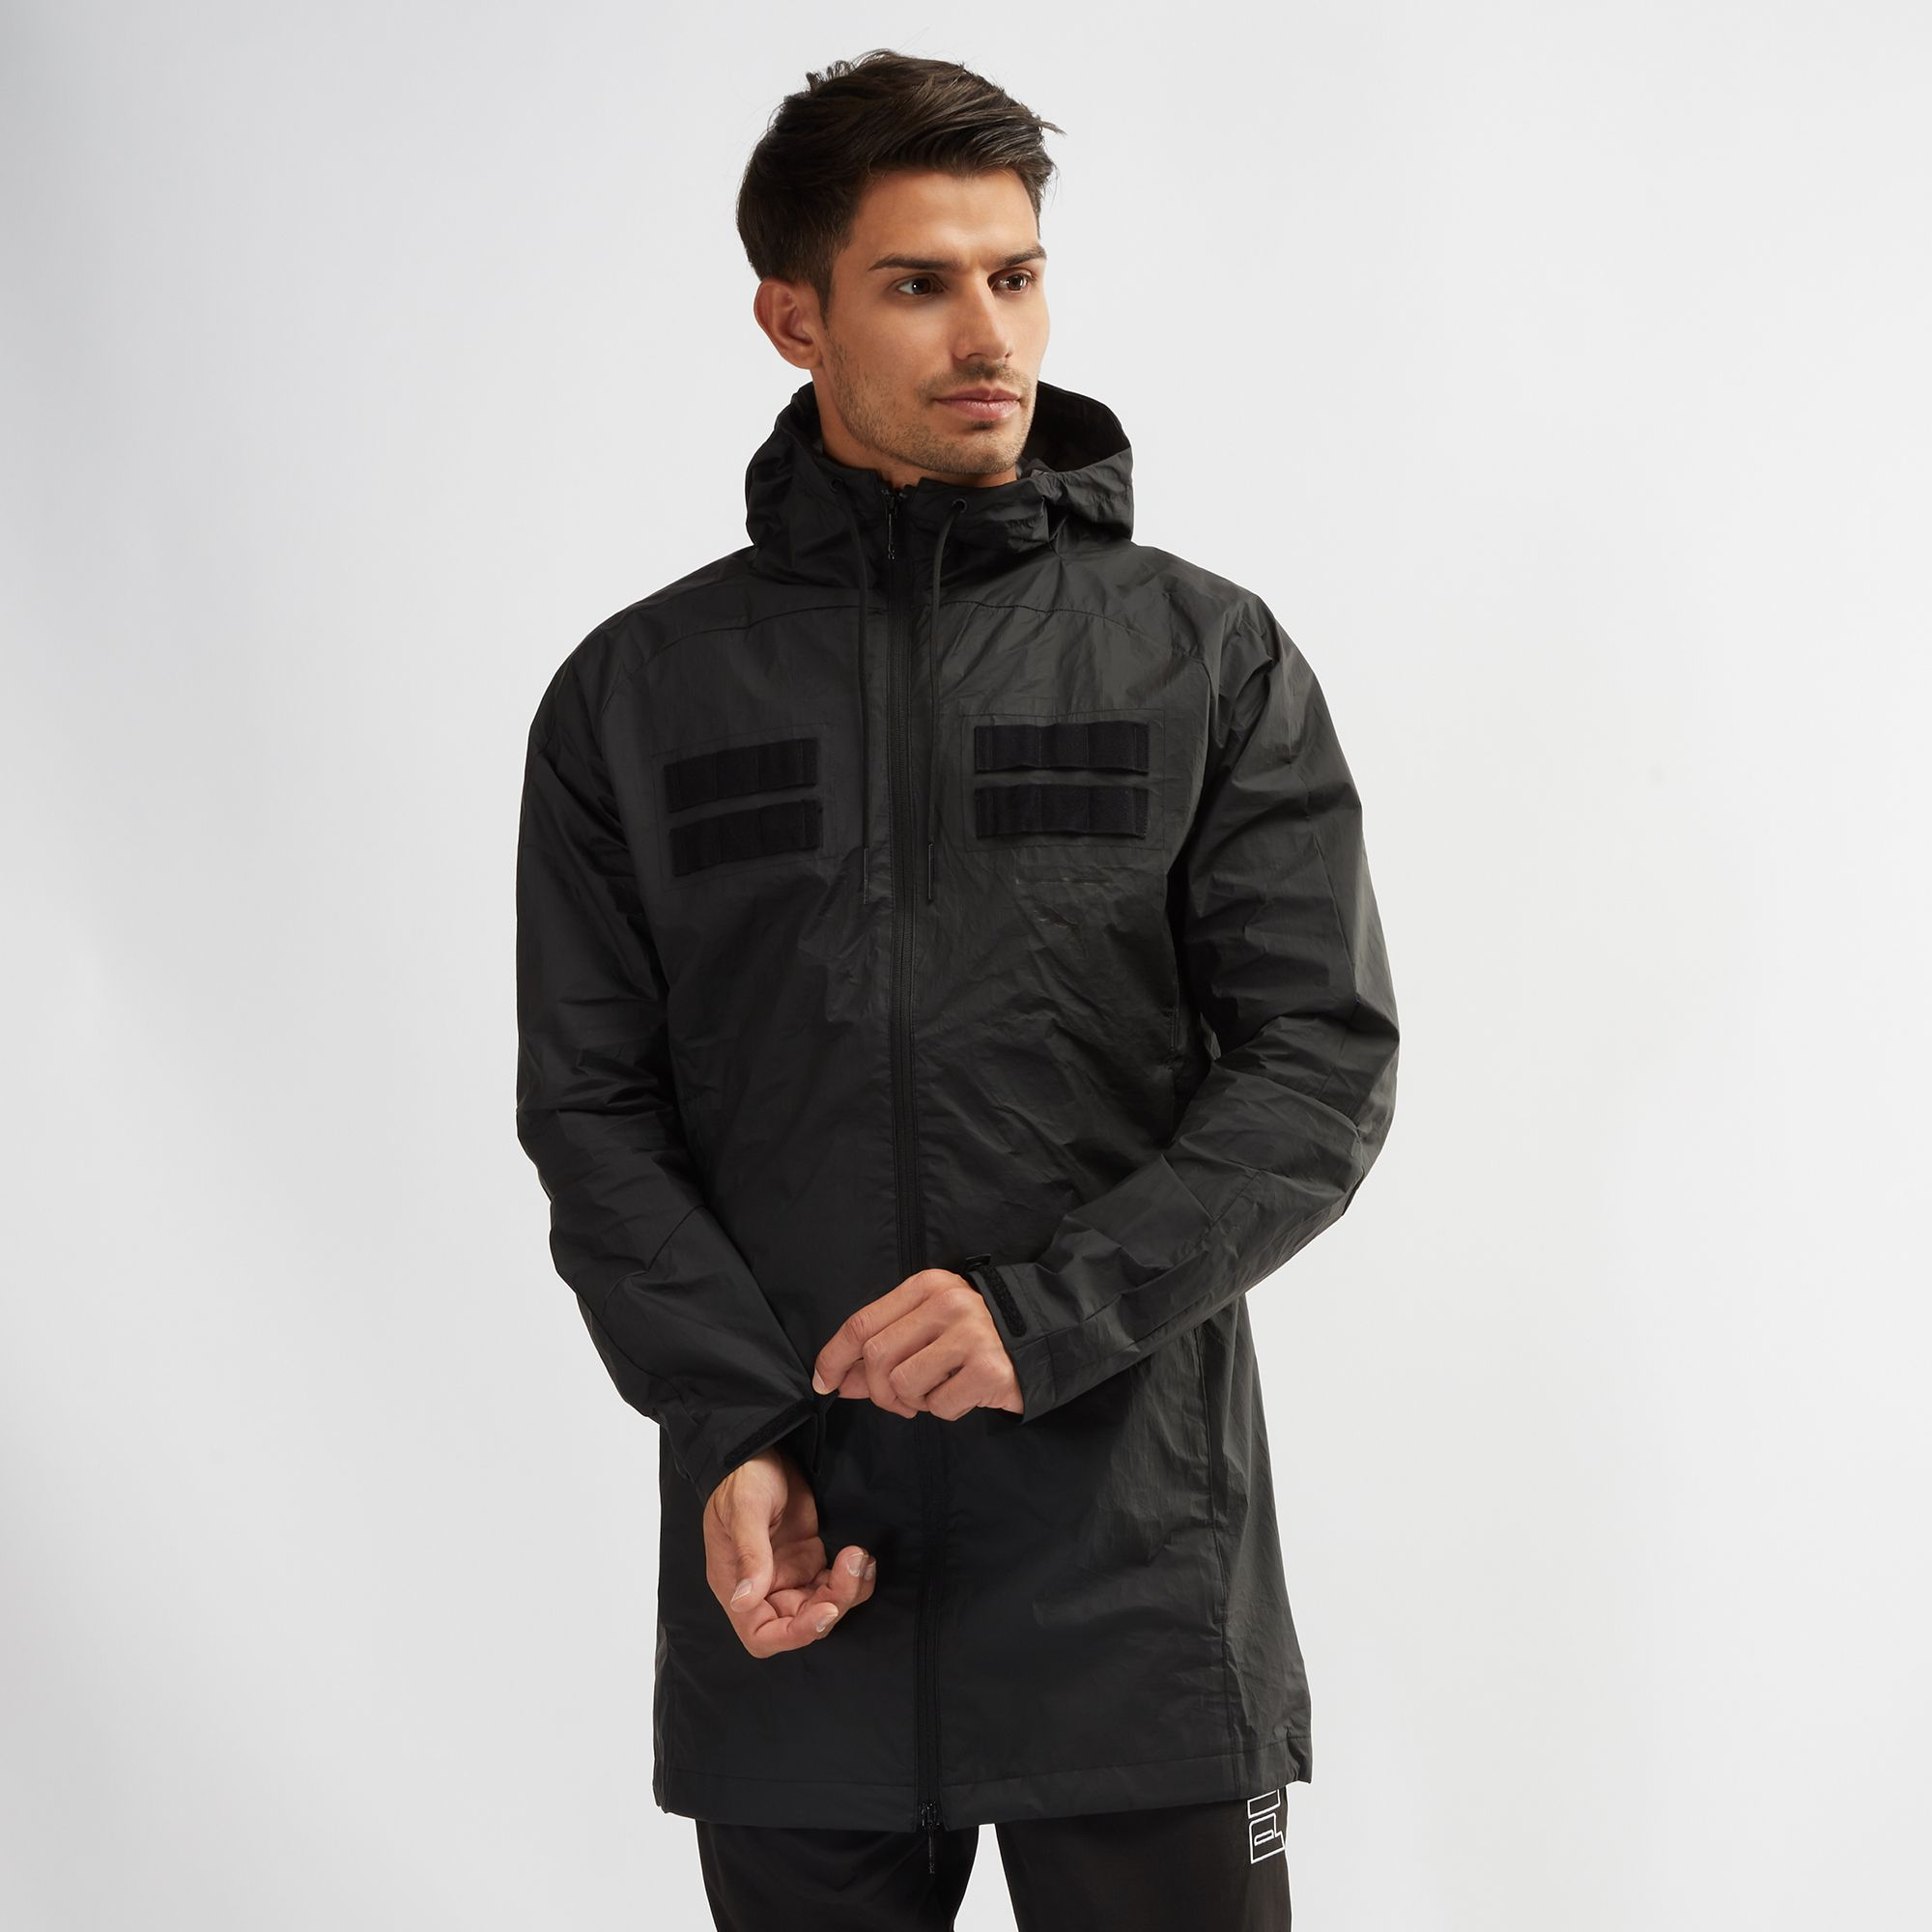 Shop Black PUMA Pace LAB Hooded Jacket for Mens by PUMA  ac45186767e6e